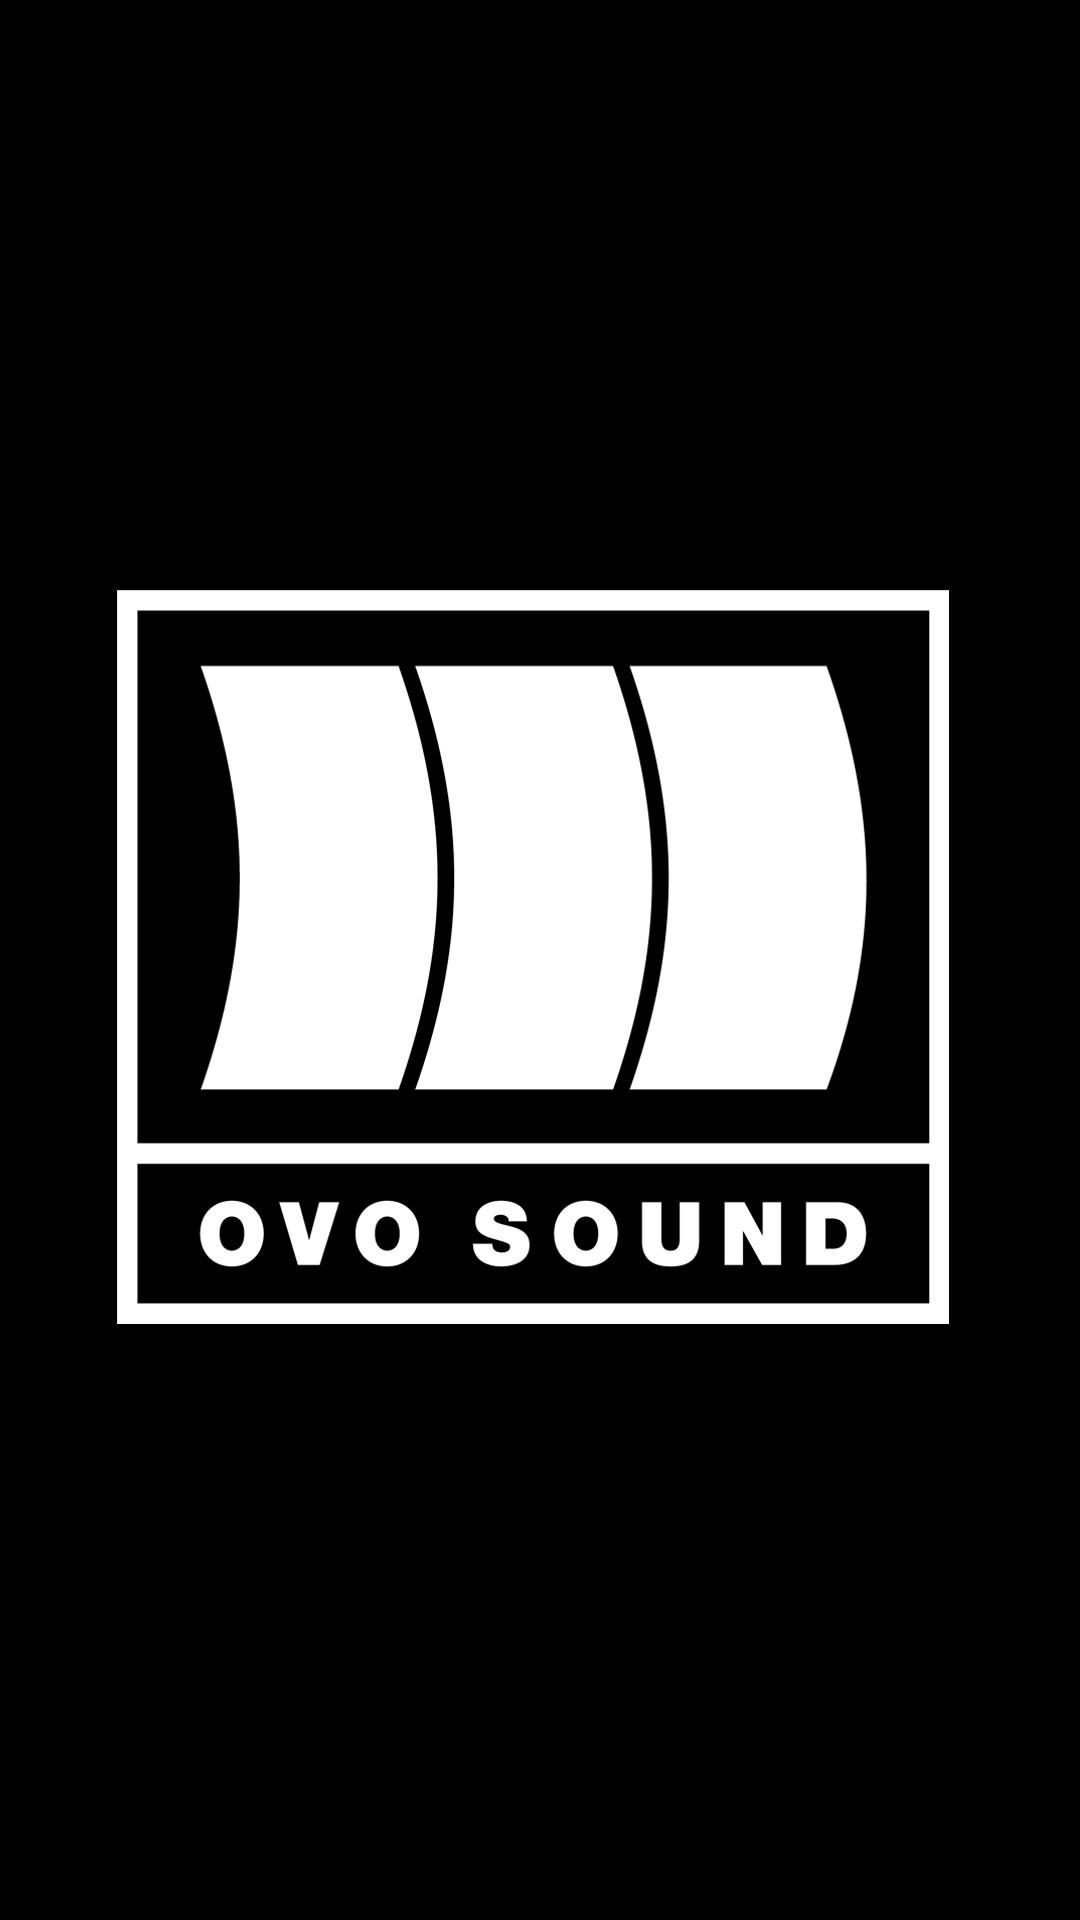 ovo sound hd wallpaper